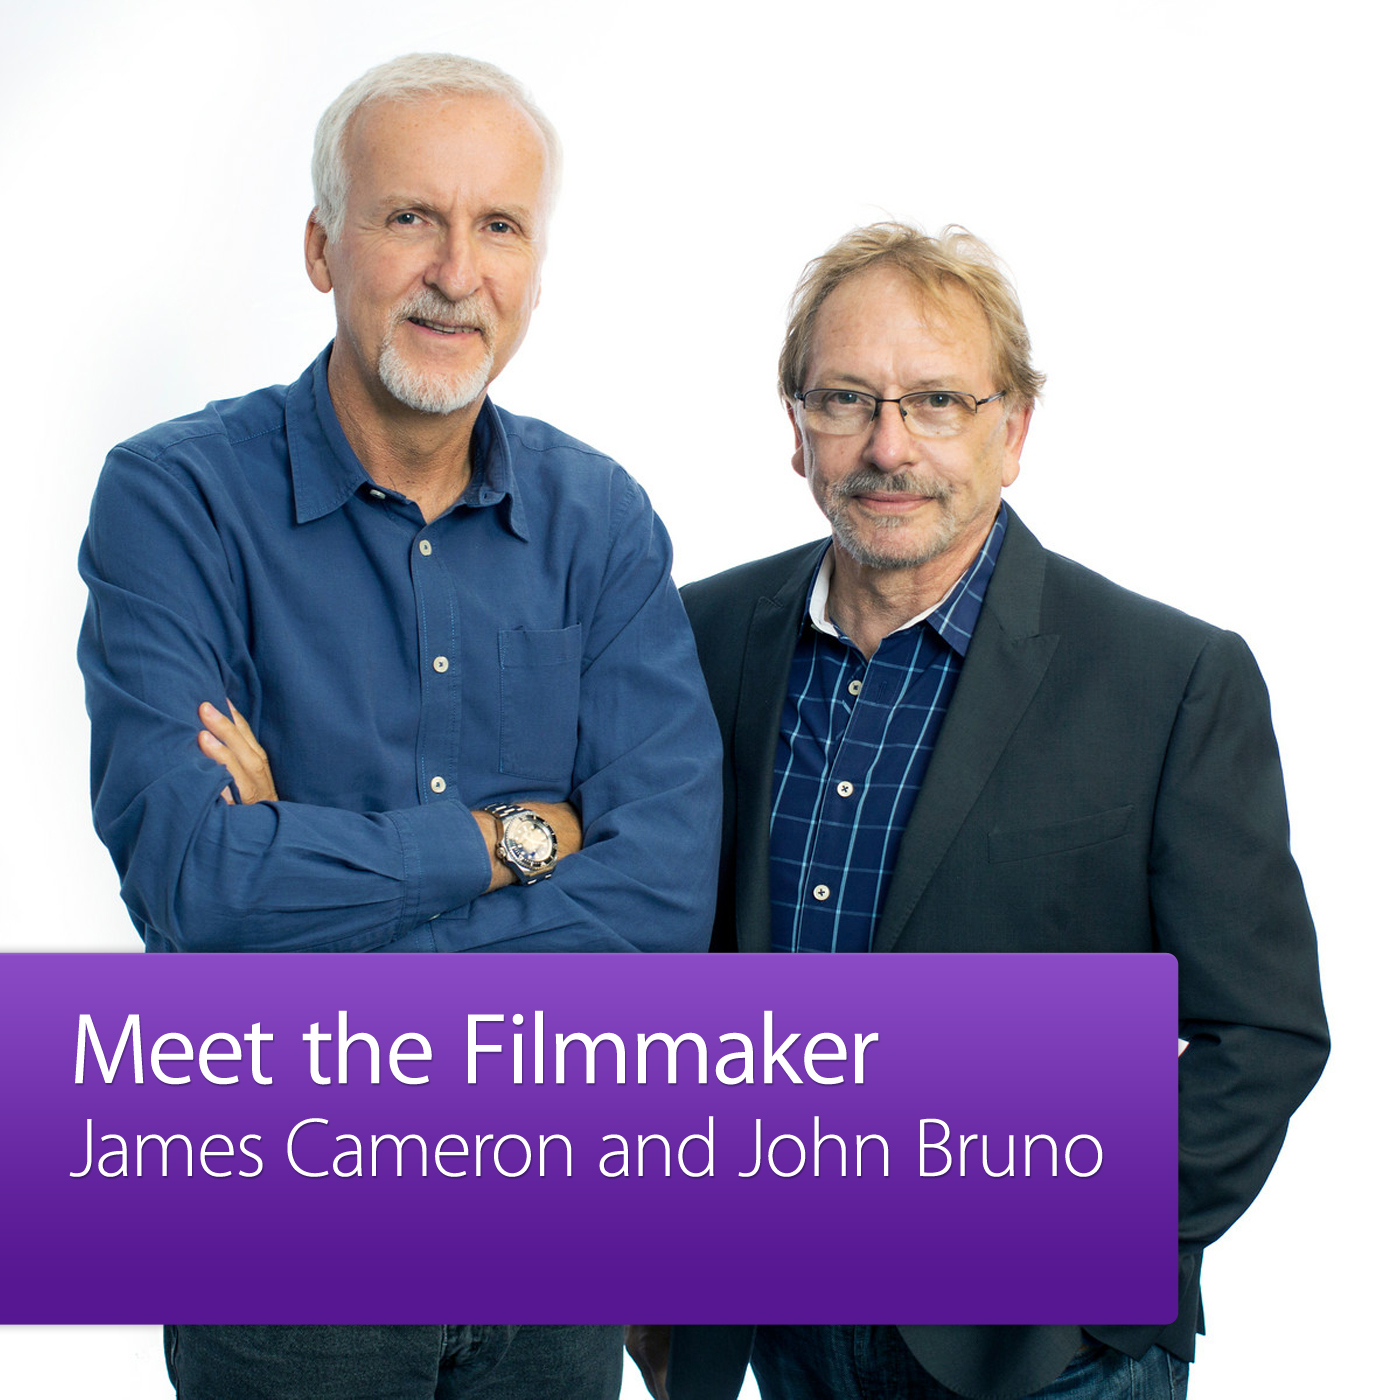 James Cameron and John Bruno: Meet the Filmmaker